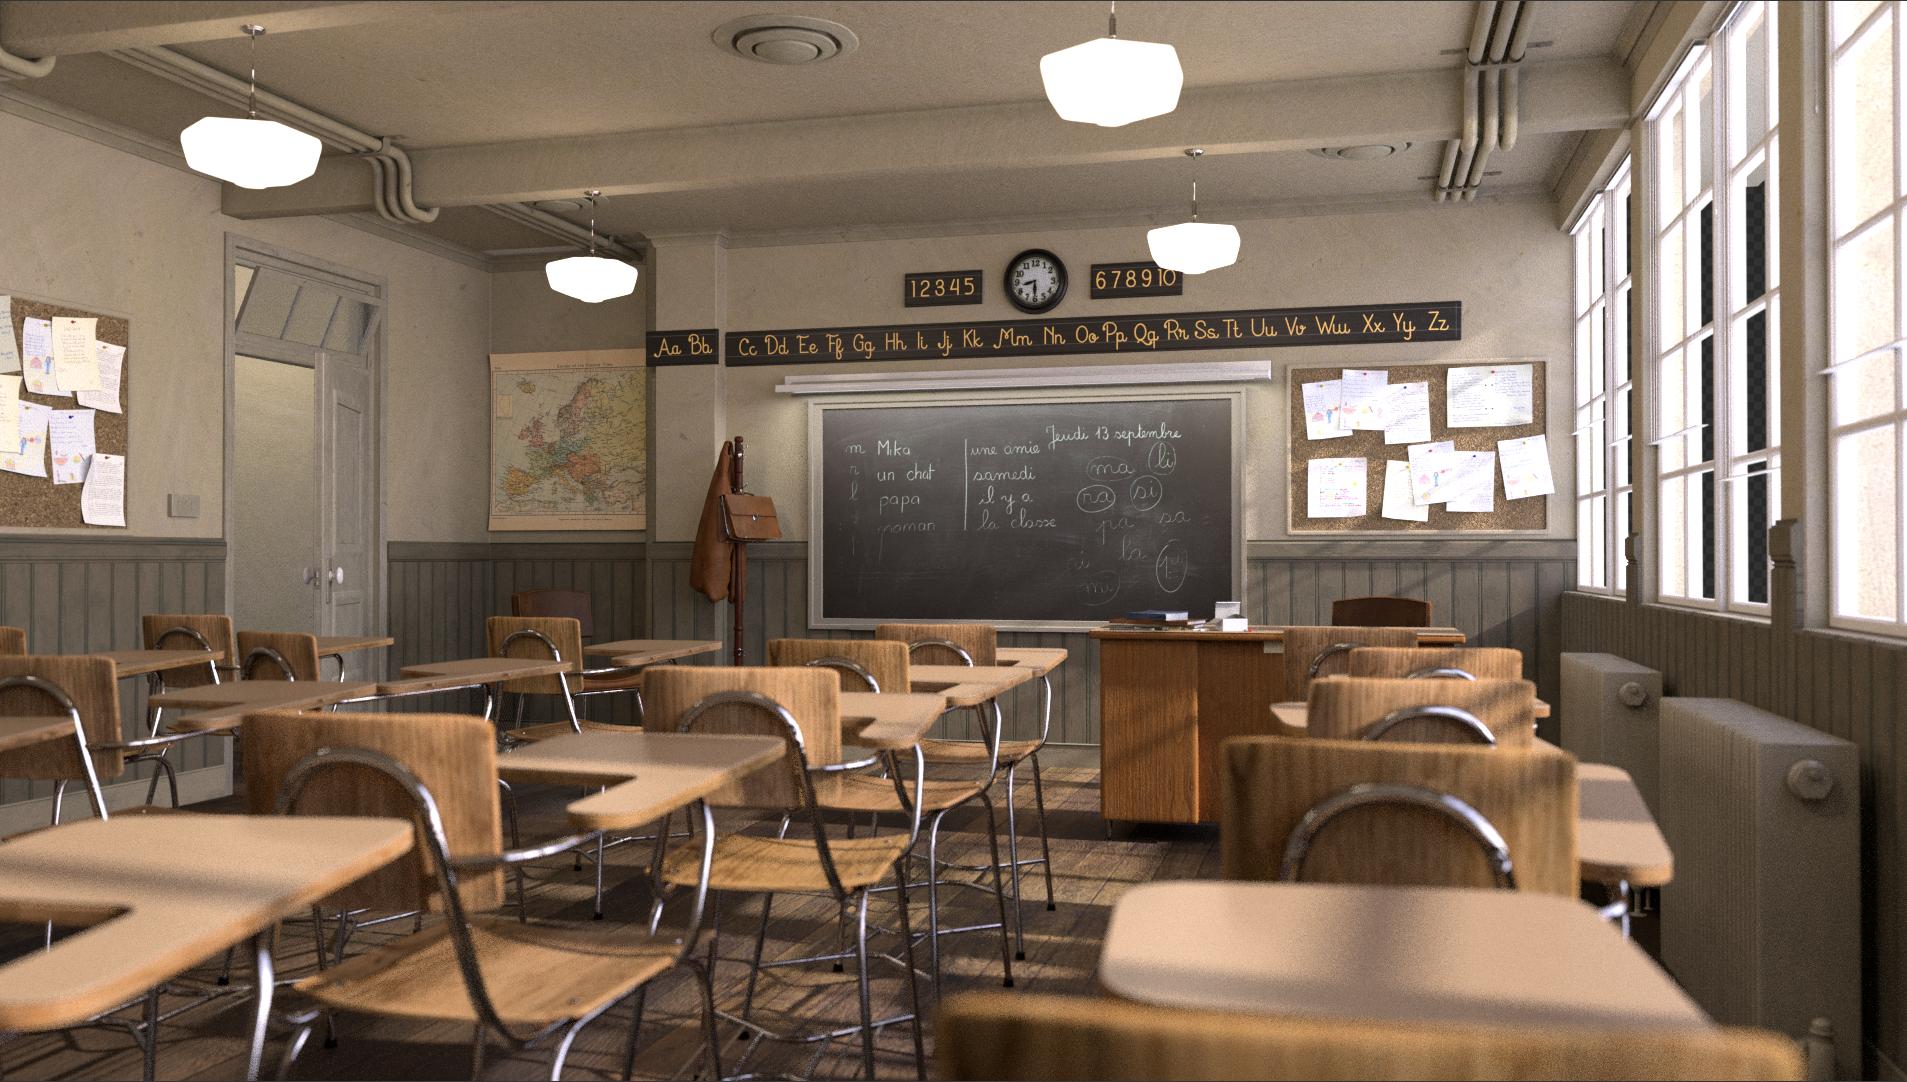 blender-classroom.png